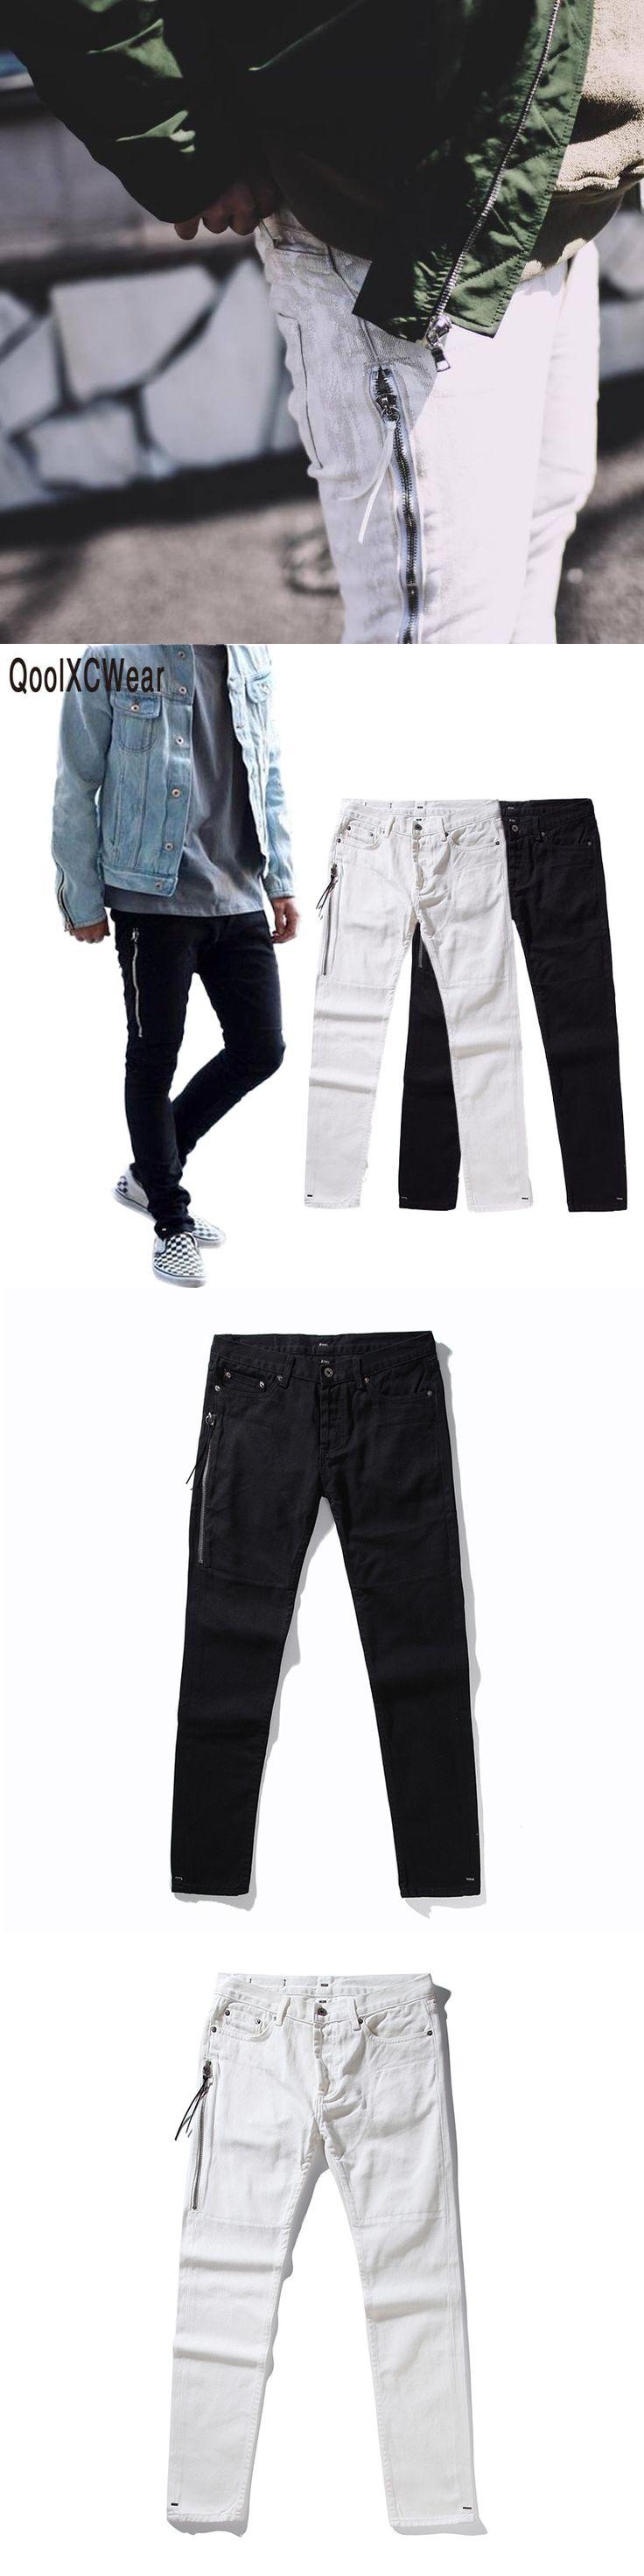 2017 NEW  Mens Biker Jeans Motorcycle Slim Fit Washed Black Grey Blue Moto Denim Pants Joggers For Skinny Men